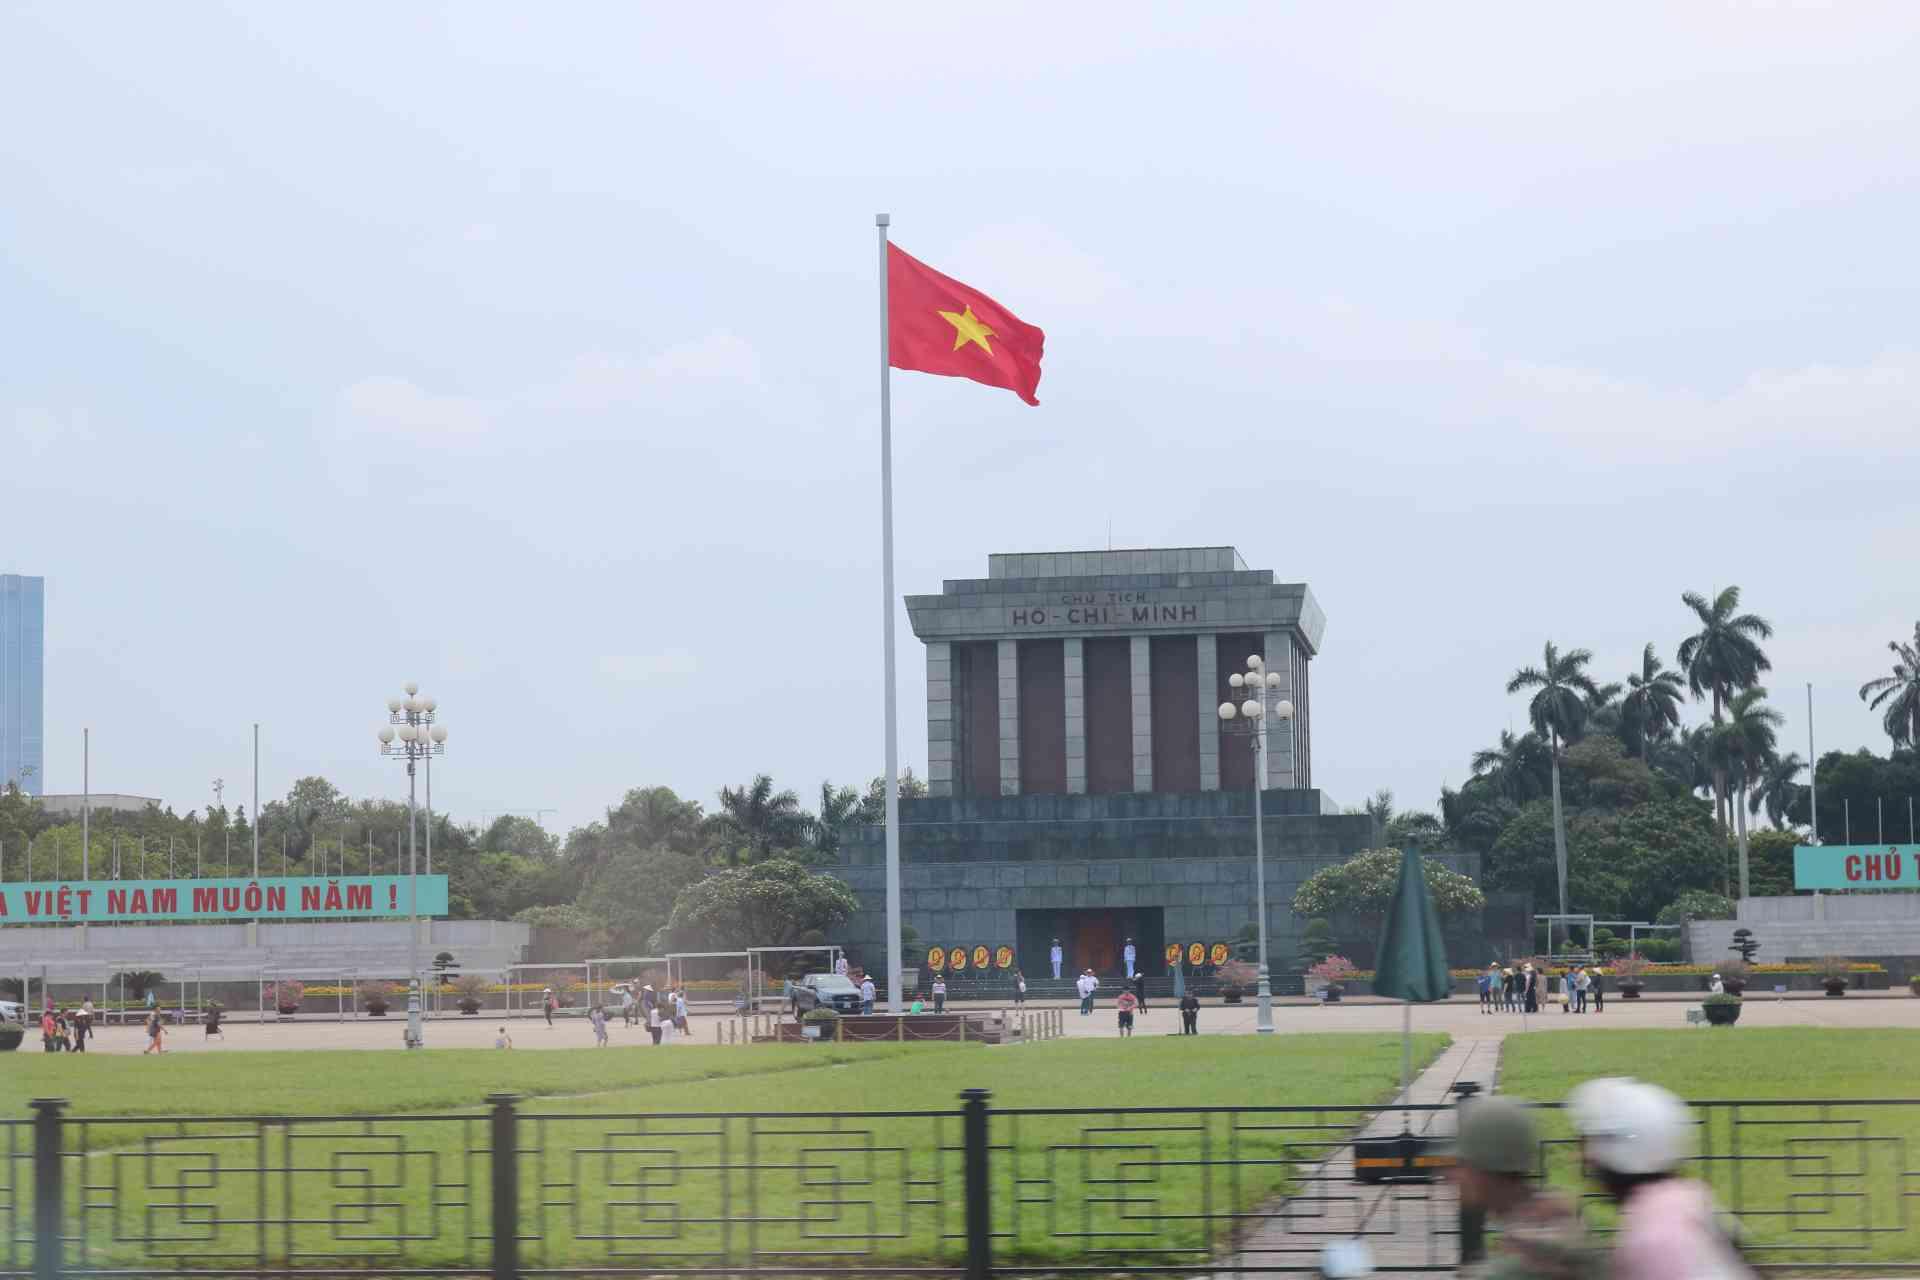 Ho Chi Minh Mausoleum, Vietnam by Kristi Rutten